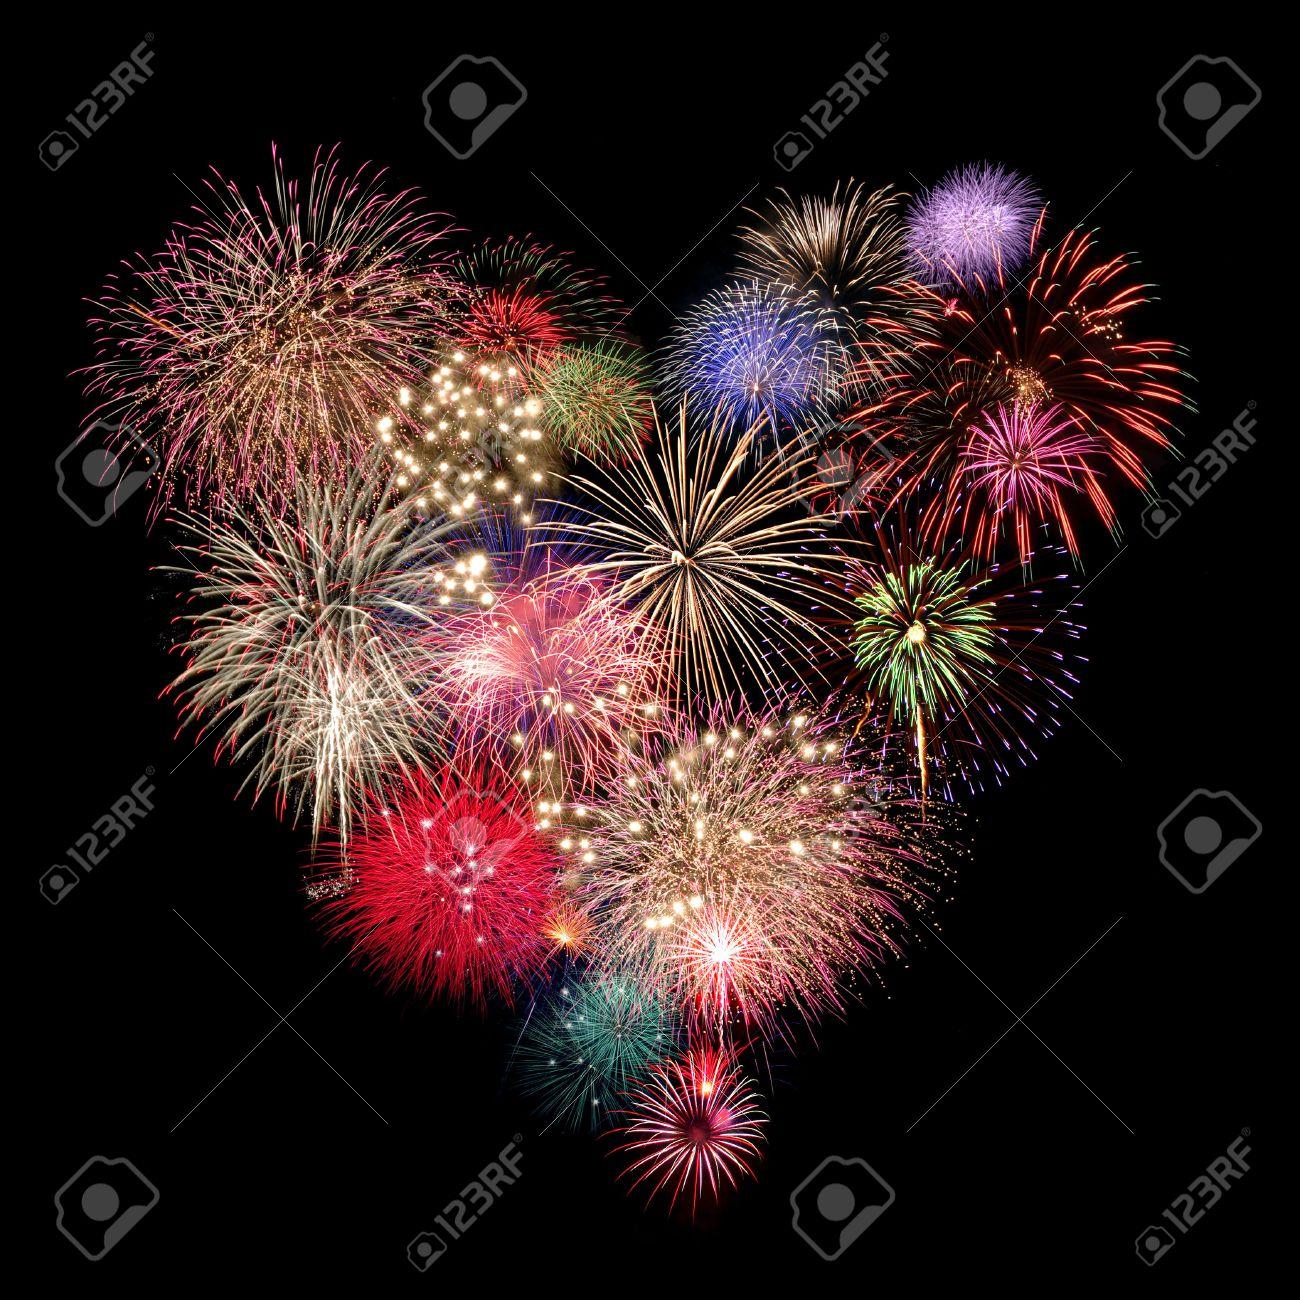 Heart Fireworks Celebration on black Background - 41446585